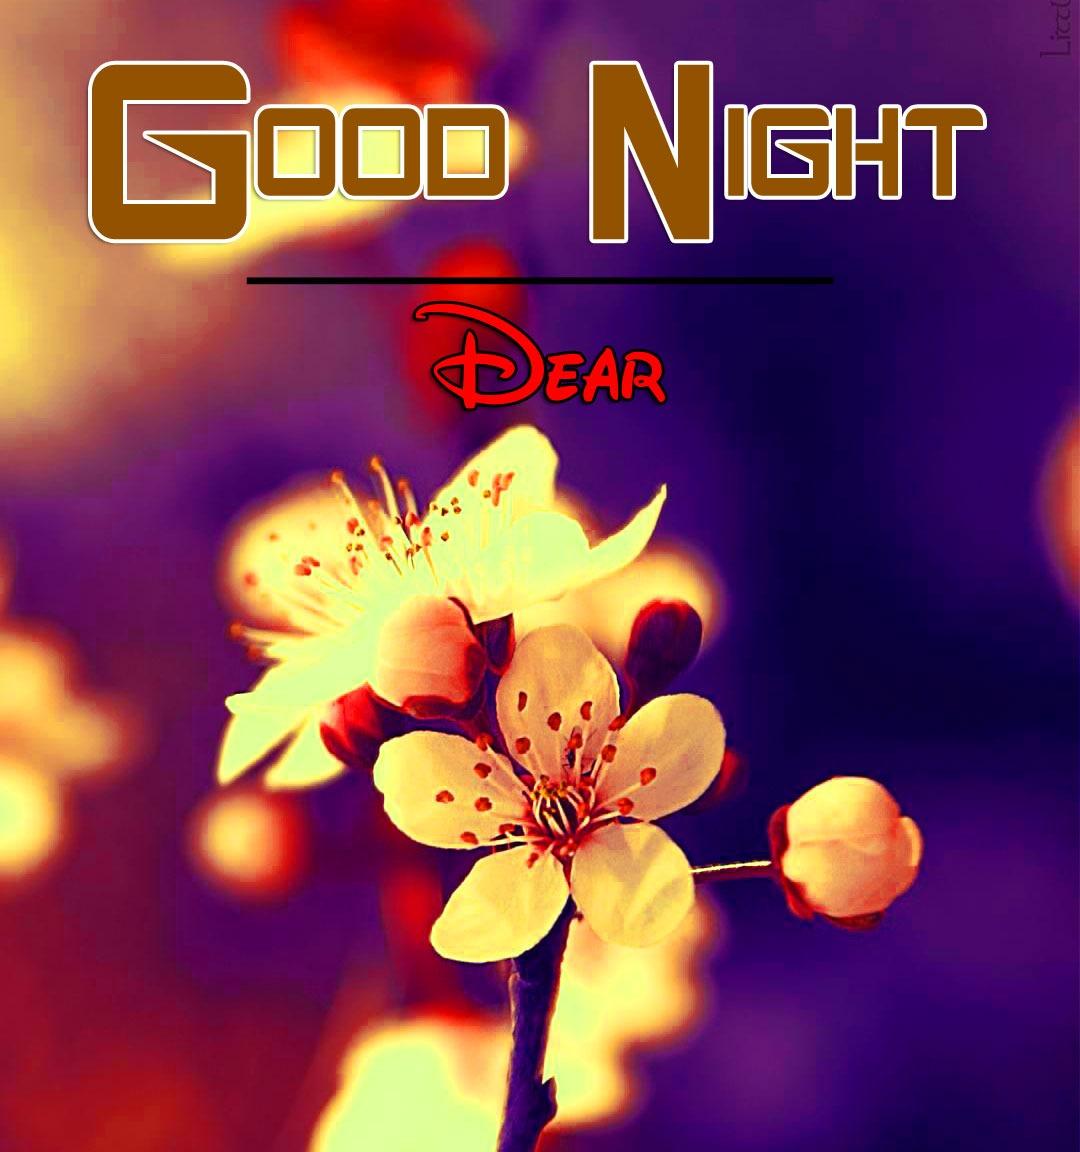 Good Night Photo Images